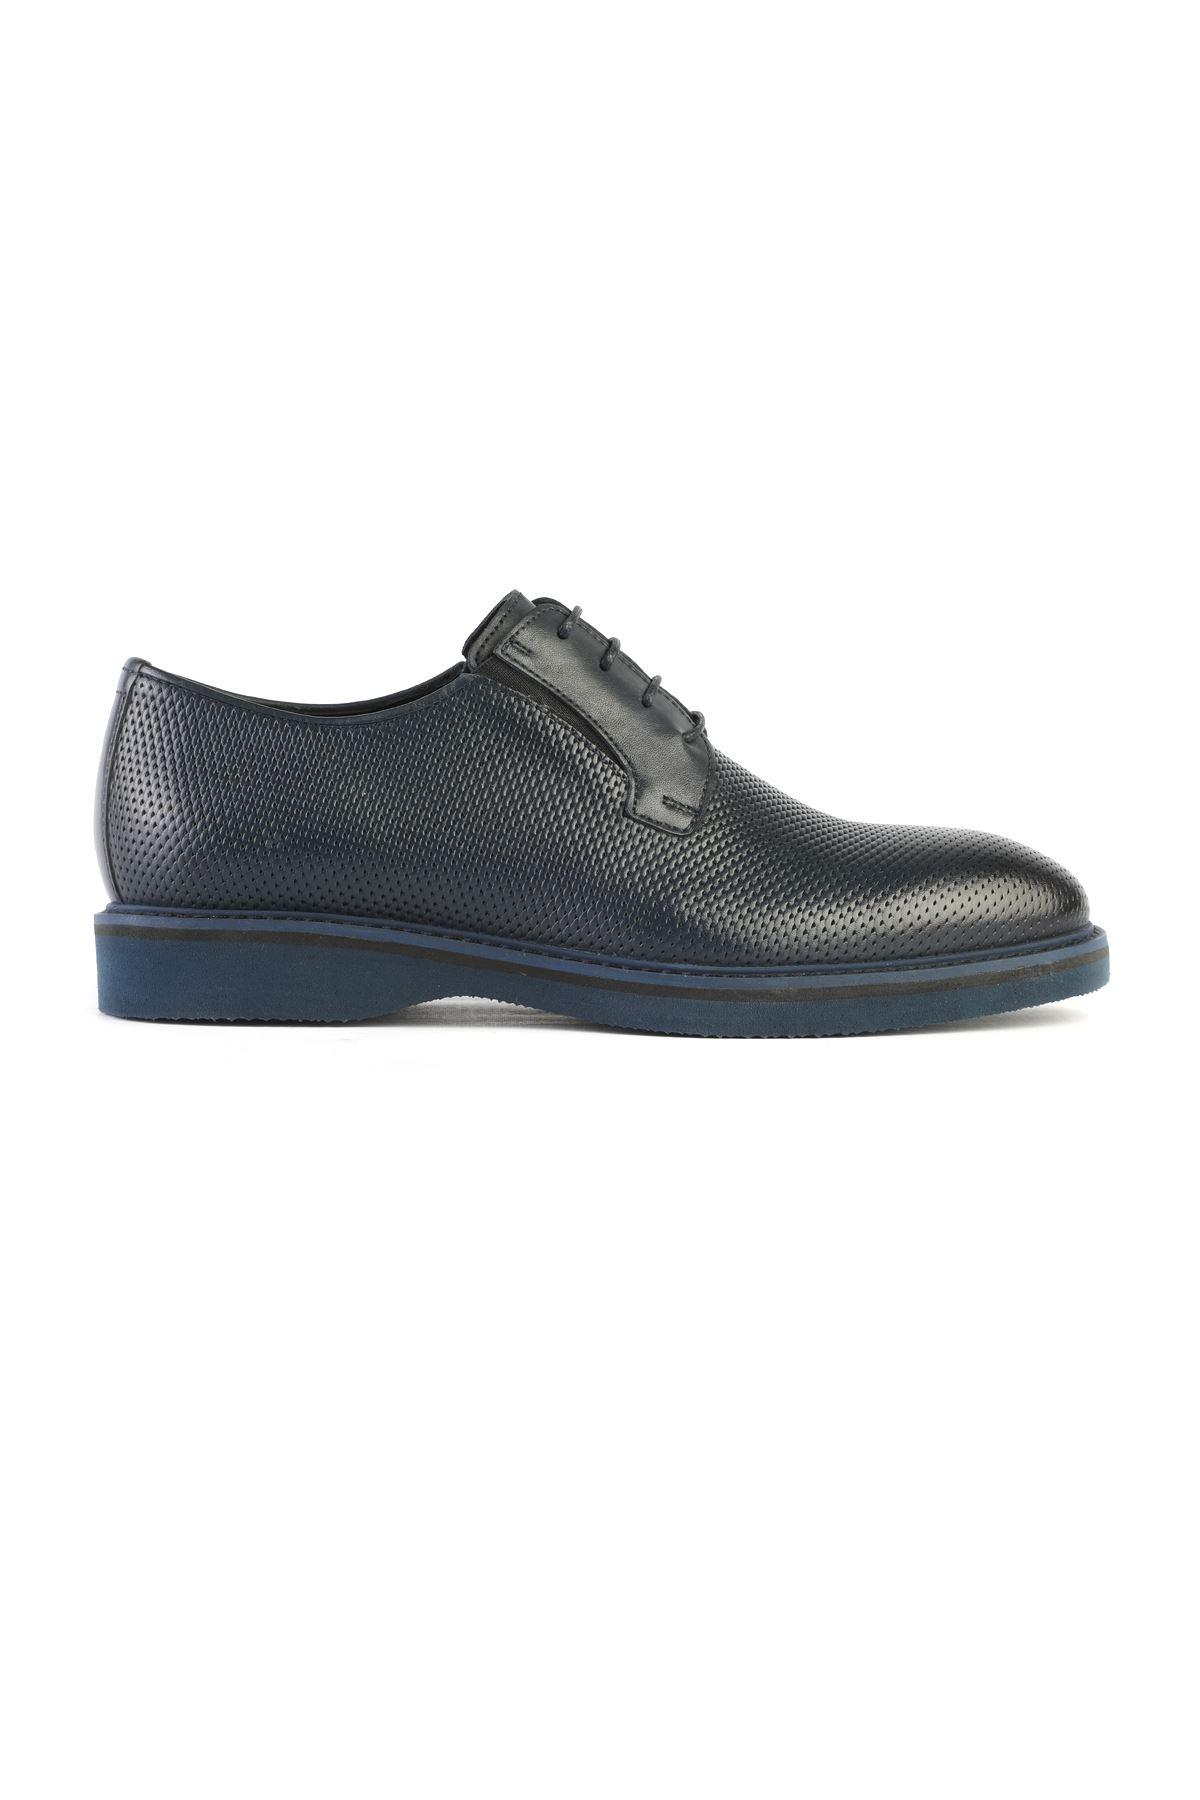 Libero 3261 Navy Blue Casual Shoes